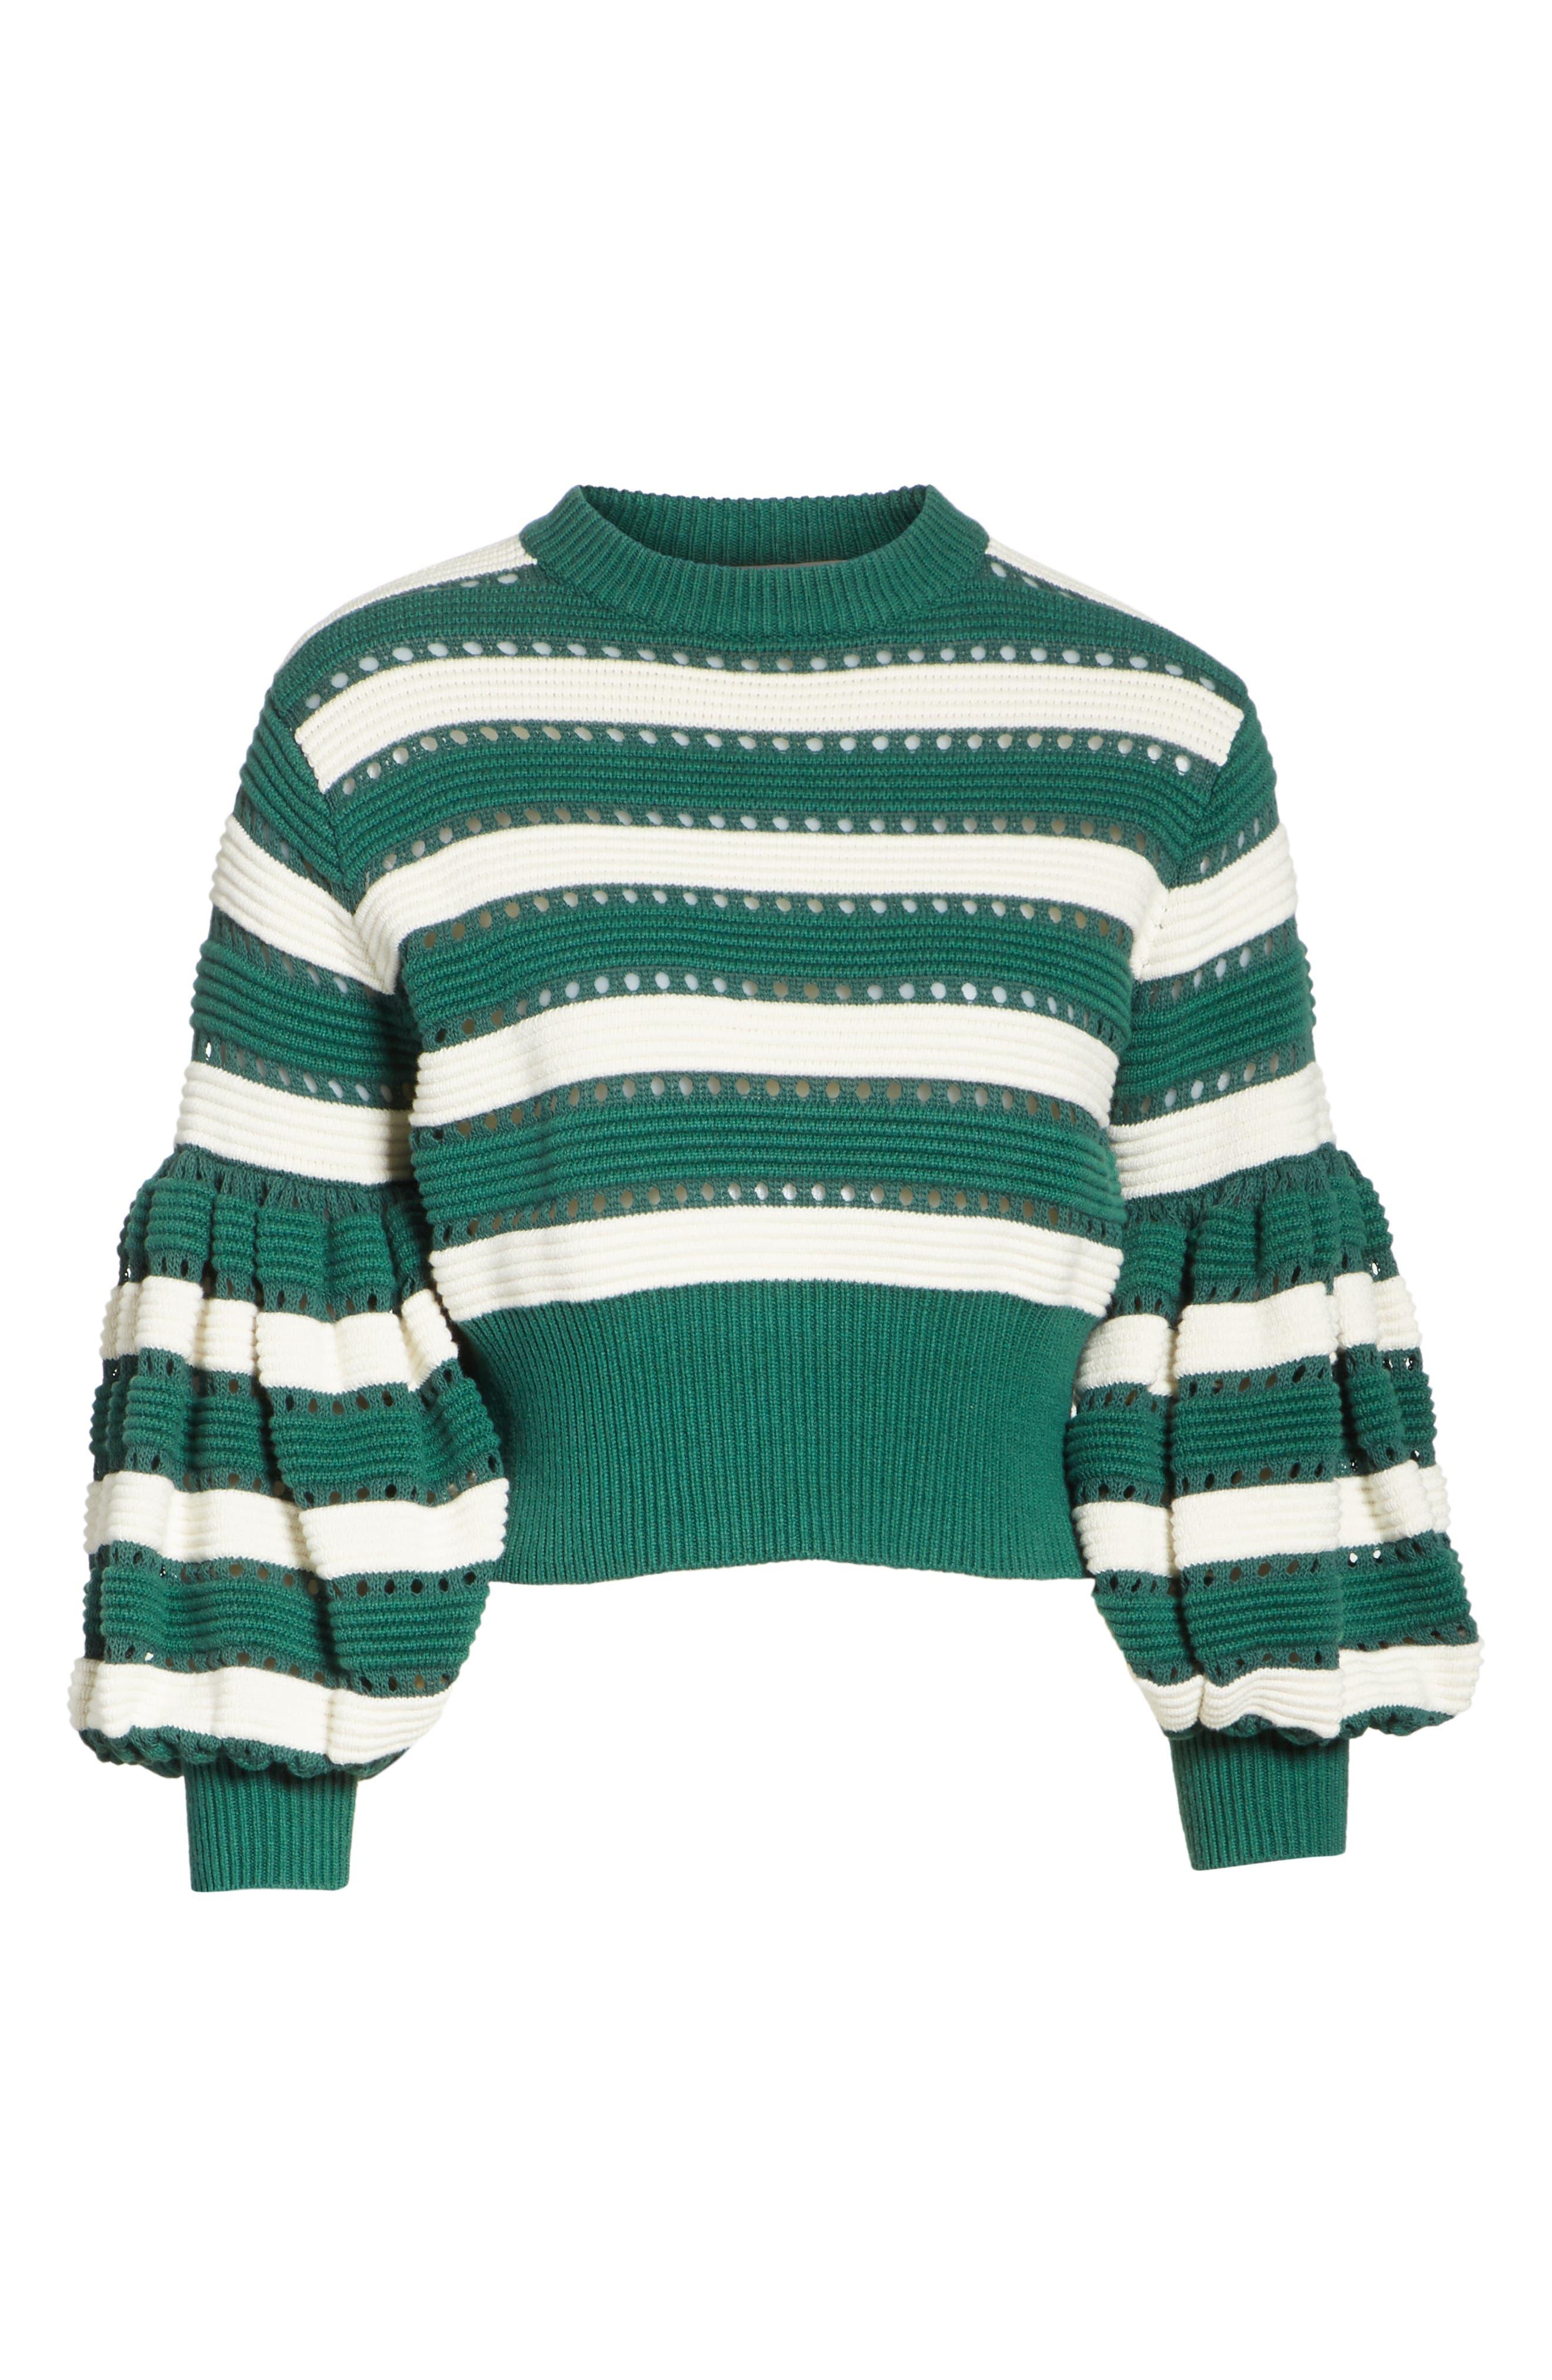 Puff Sleeve Cotton & Wool Crop Sweater,                             Alternate thumbnail 6, color,                             GREEN-CREAM